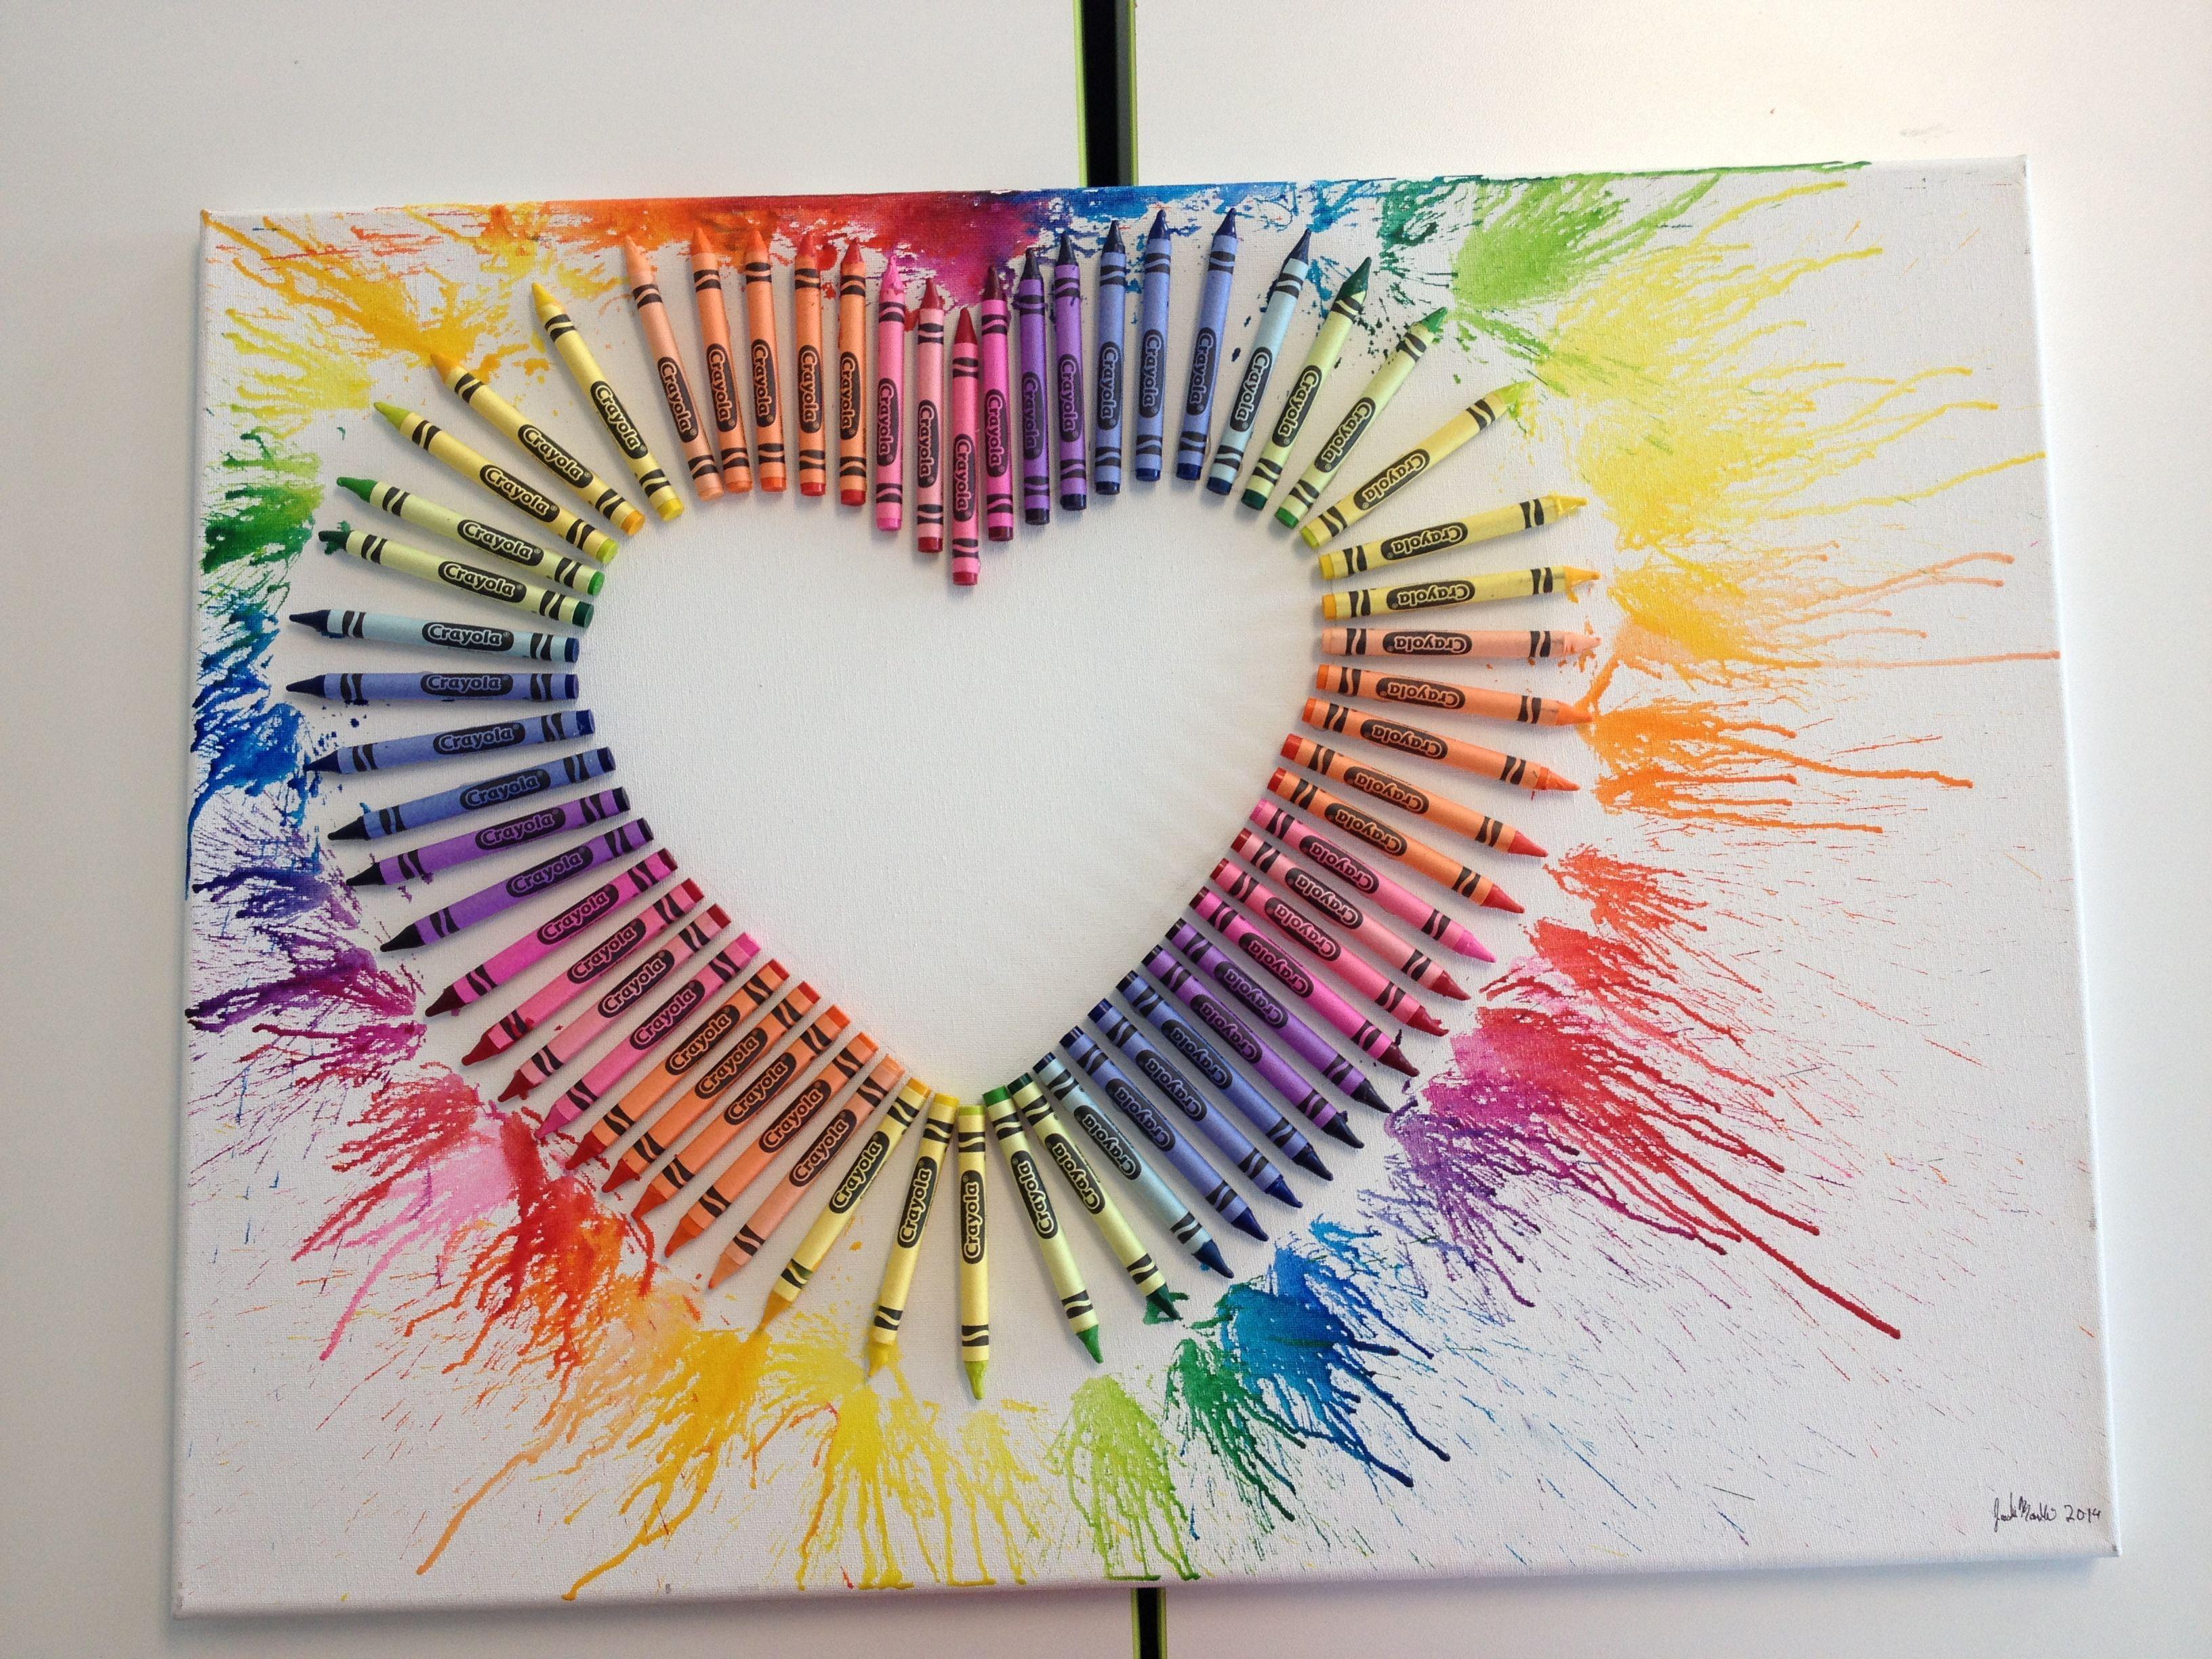 Crayon heart art #crayonheart Crayon heart art #crayonheart Crayon heart art #crayonheart Crayon heart art #crayonheart